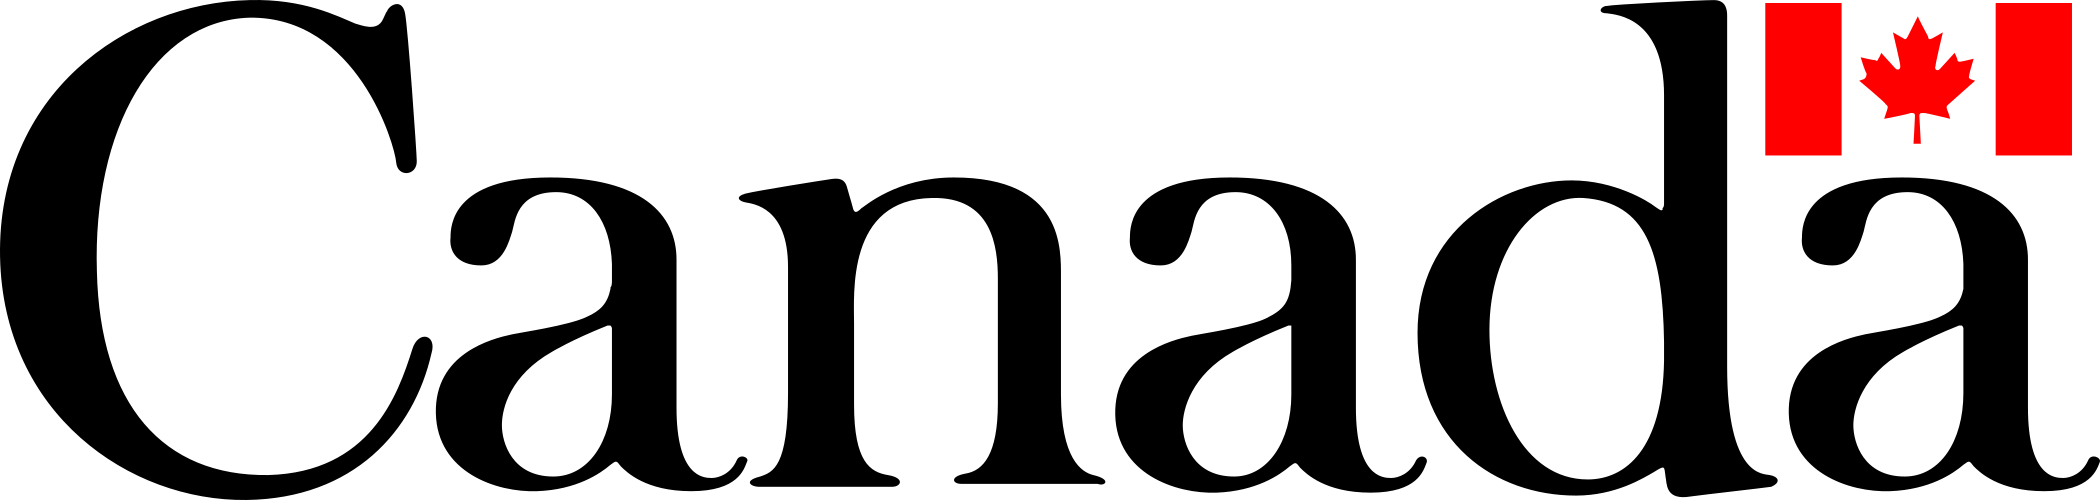 canada logo 1 - Canada Logo